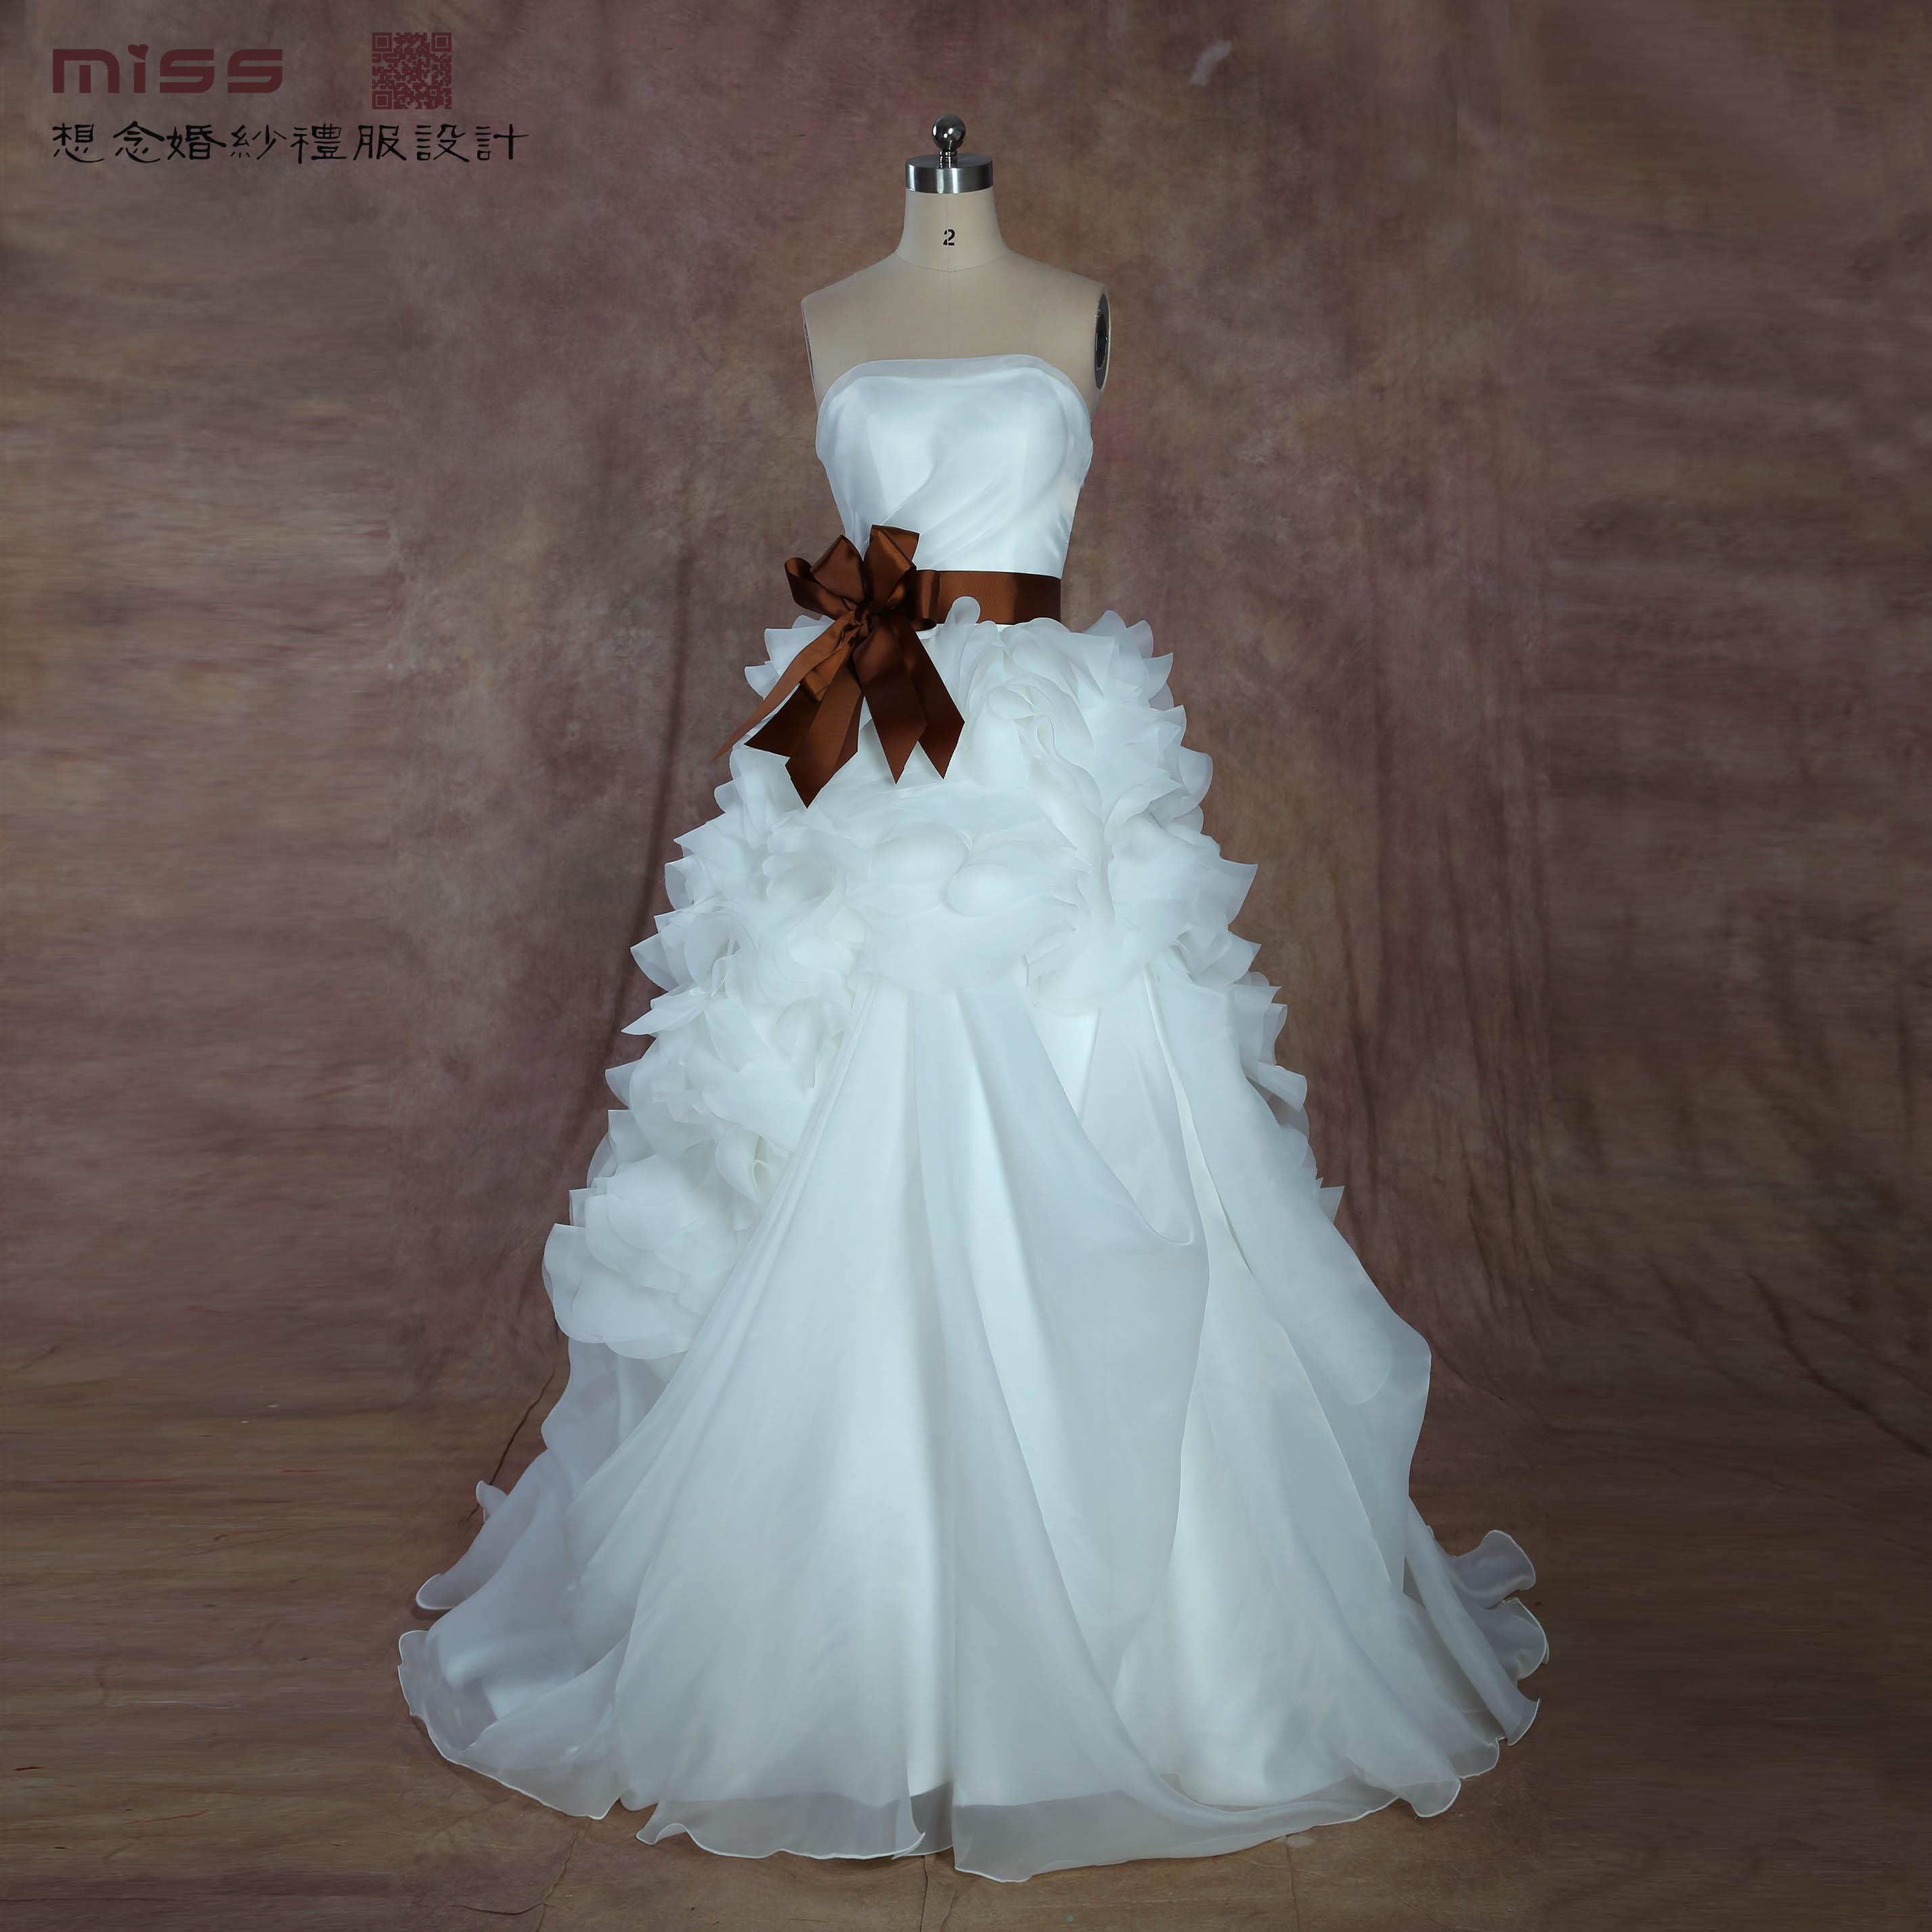 verawang王婚纱图片